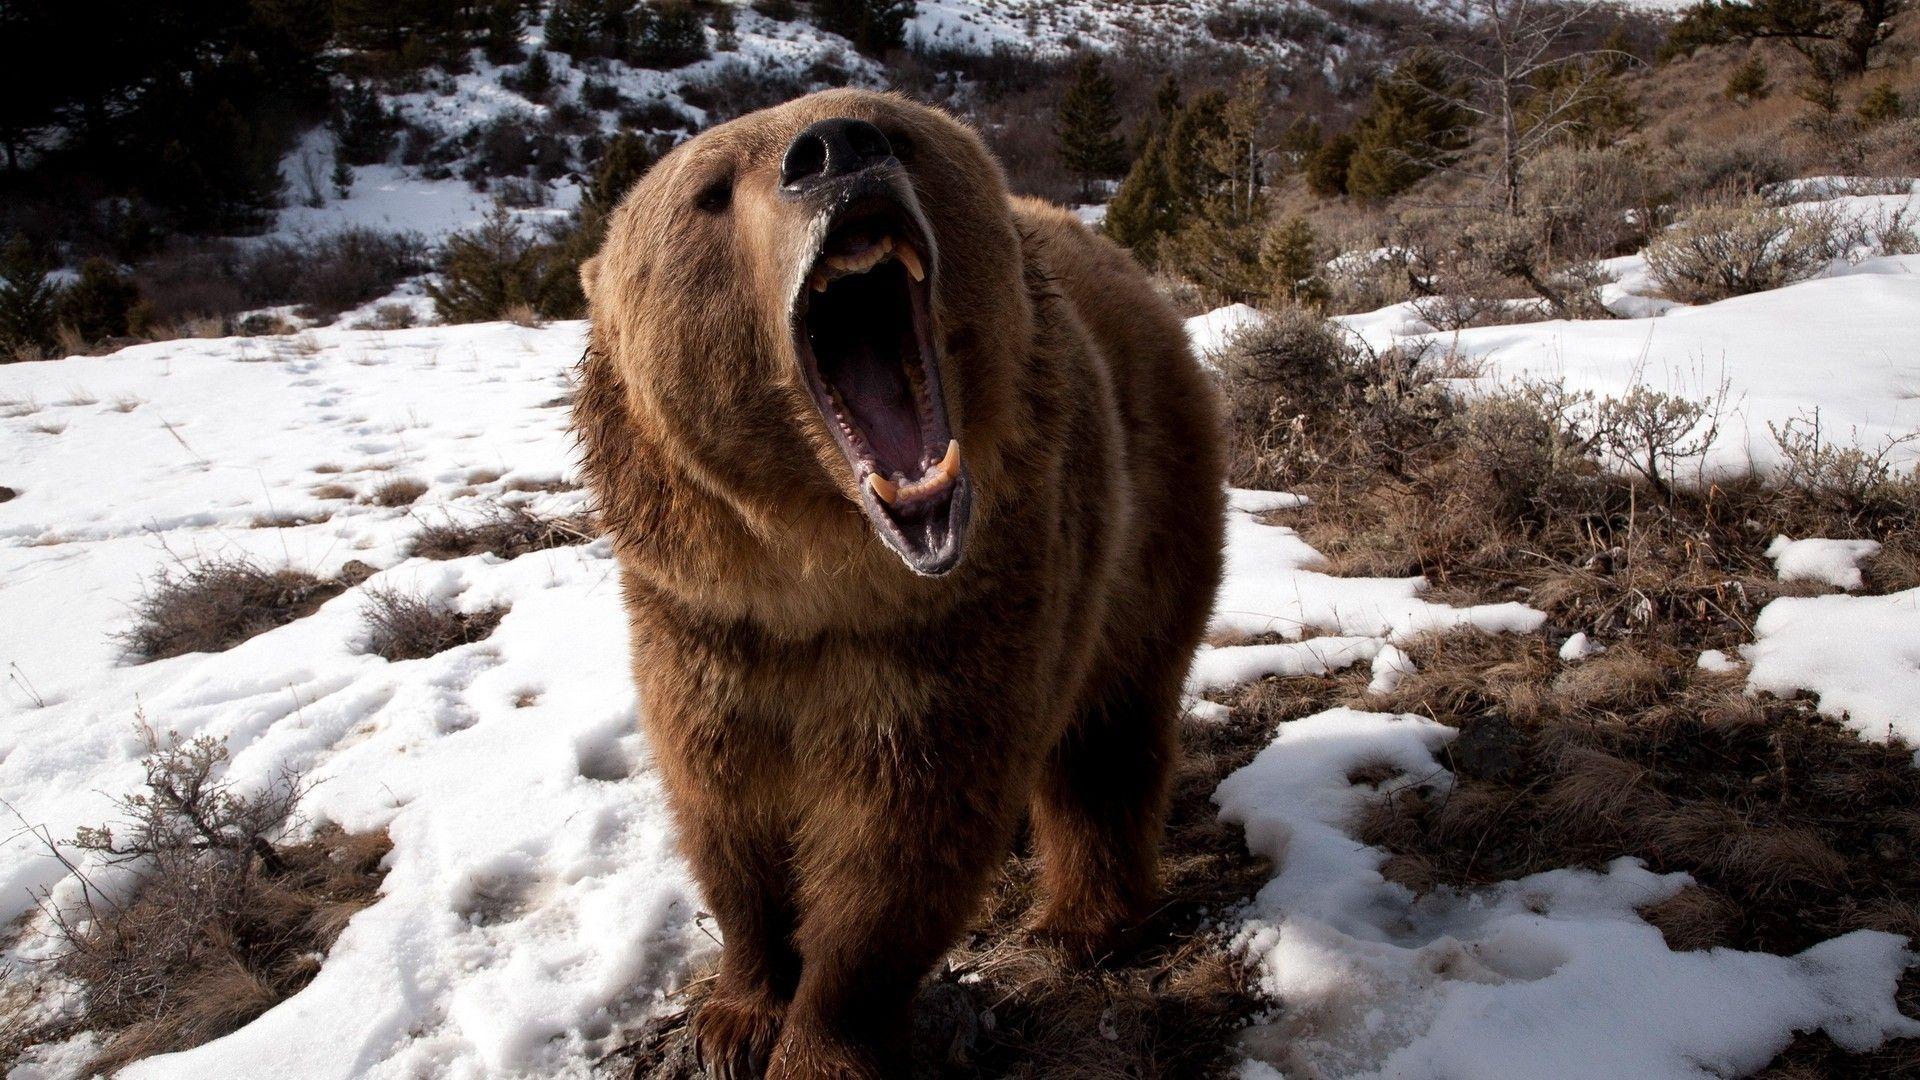 Bear, Wildlife, Brown Bear, Snow, Grizzly Bear Wallpaper In Resol